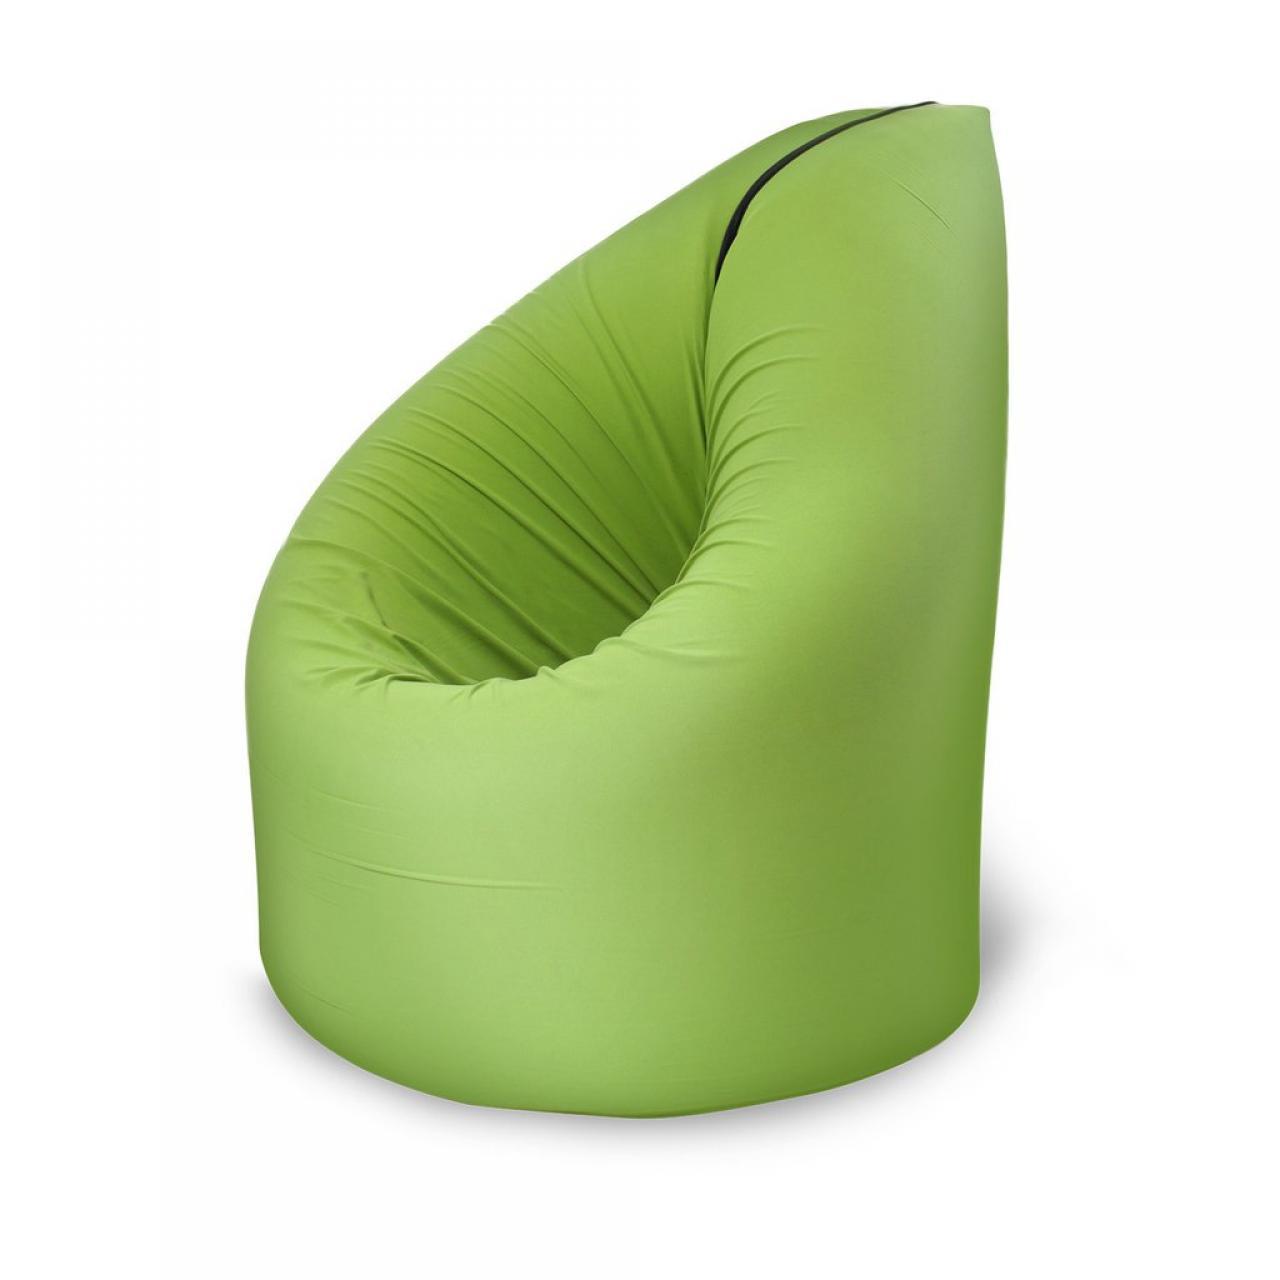 Paq Sitzsack/Bett in grün